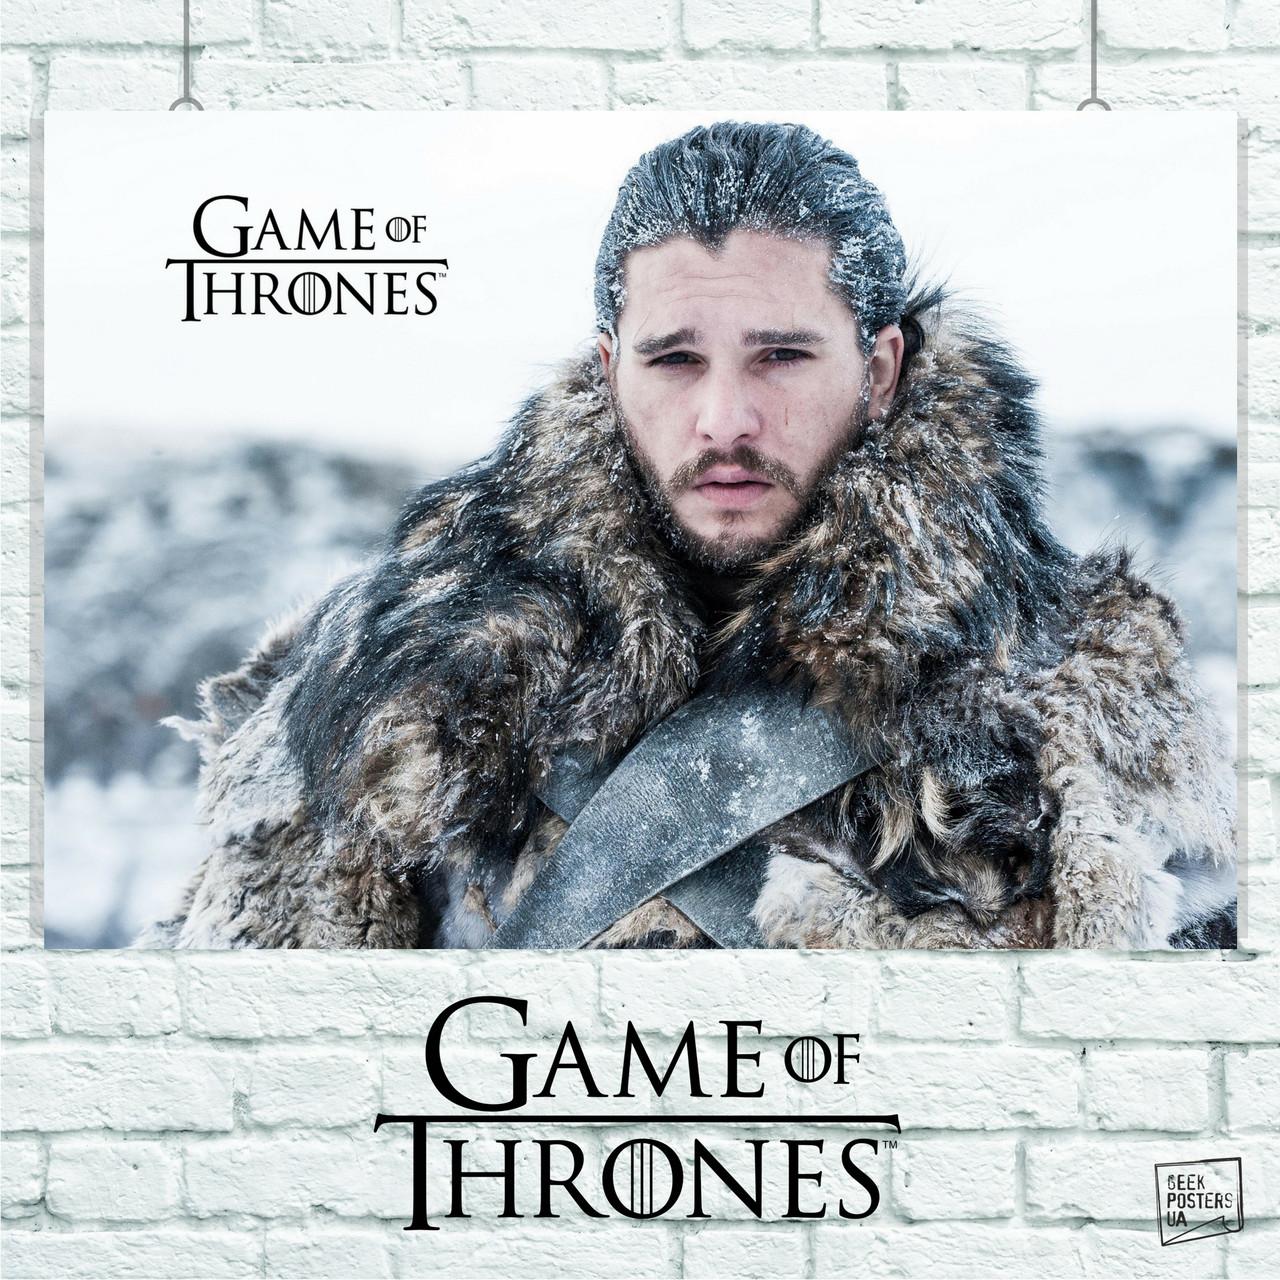 Постер Джон Сноу, Игра Престолов, Game Of Thrones, GOT. Размер 60x42см (A2). Глянцевая бумага